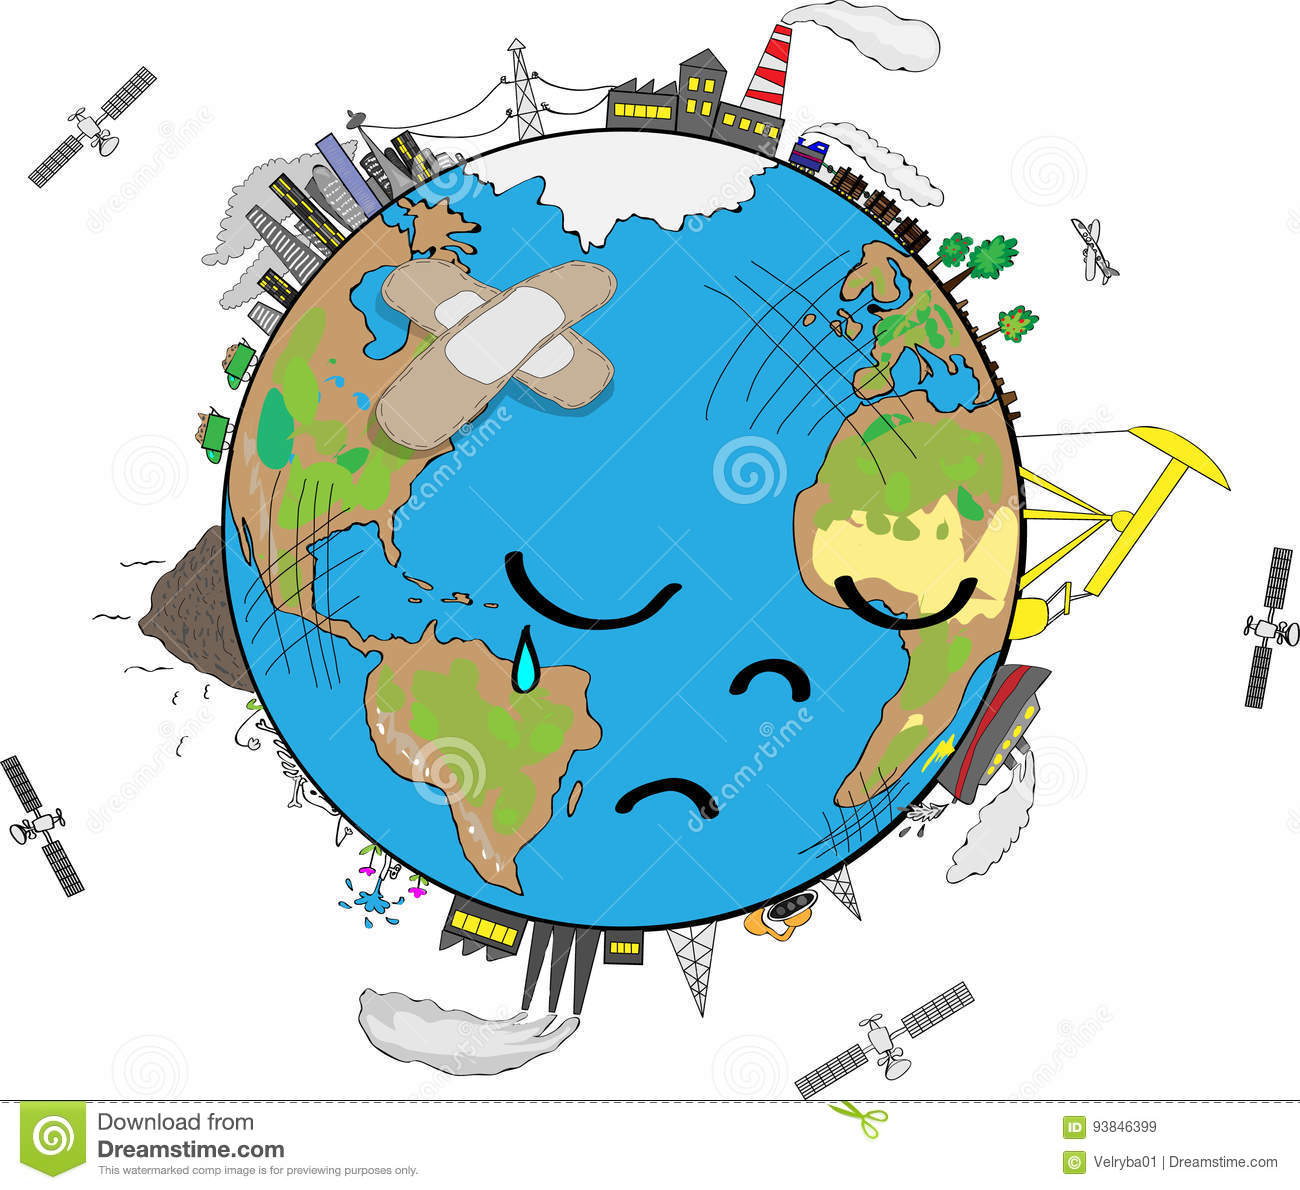 sad-planet-earth-crying-face-environmental-pollution-hand-drawn-cartoon-illustration-93846399